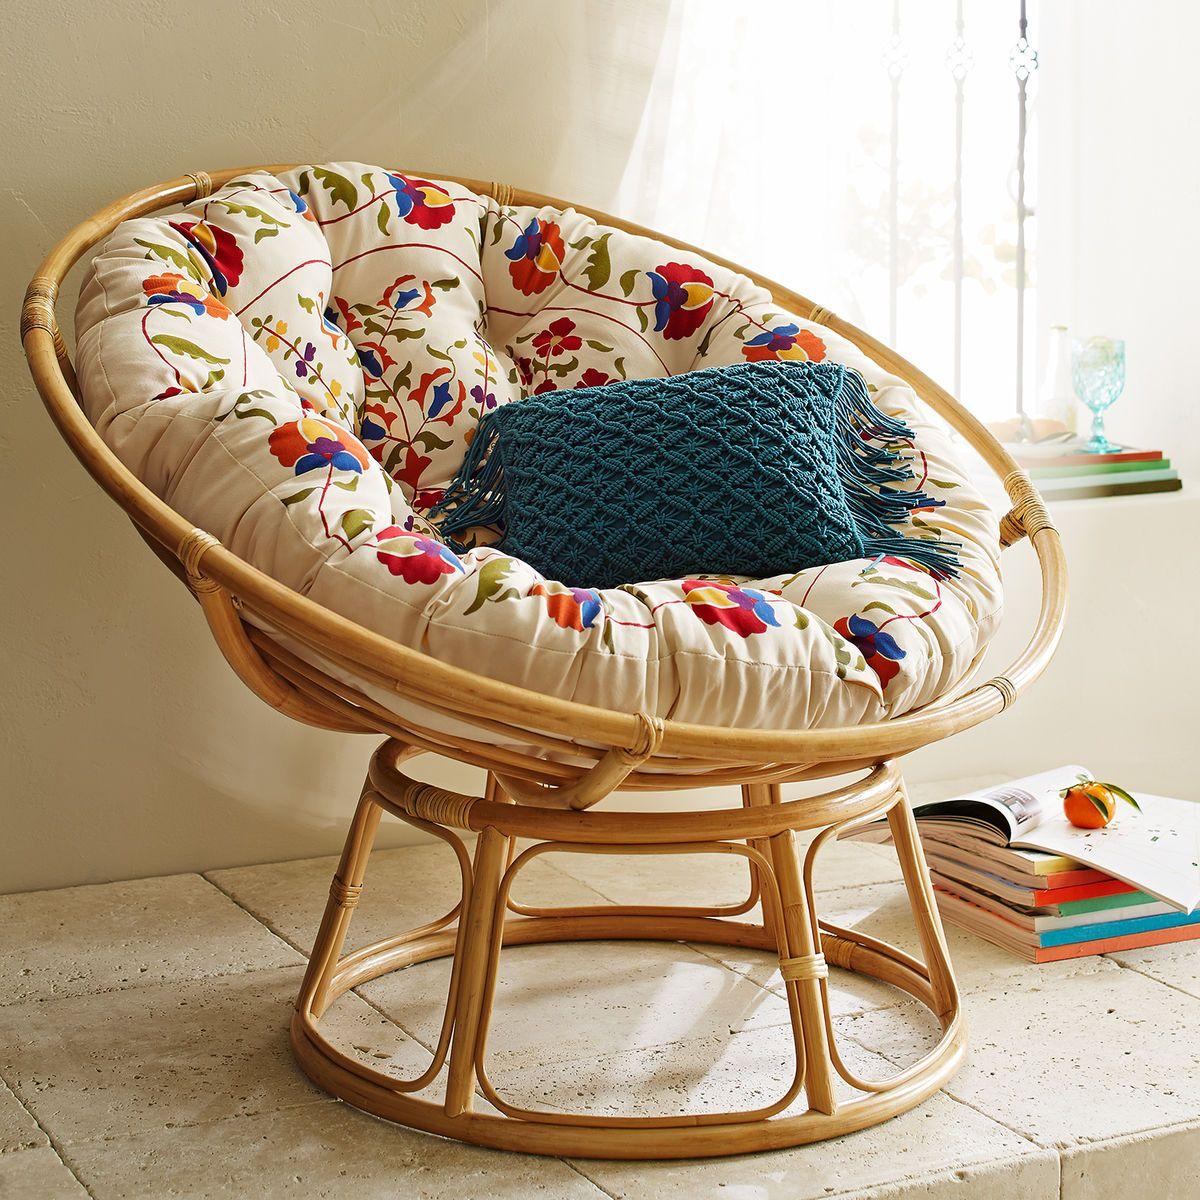 Exceptionnel Papasan Chair Cushion   Boho Floral | Pier 1 Imports